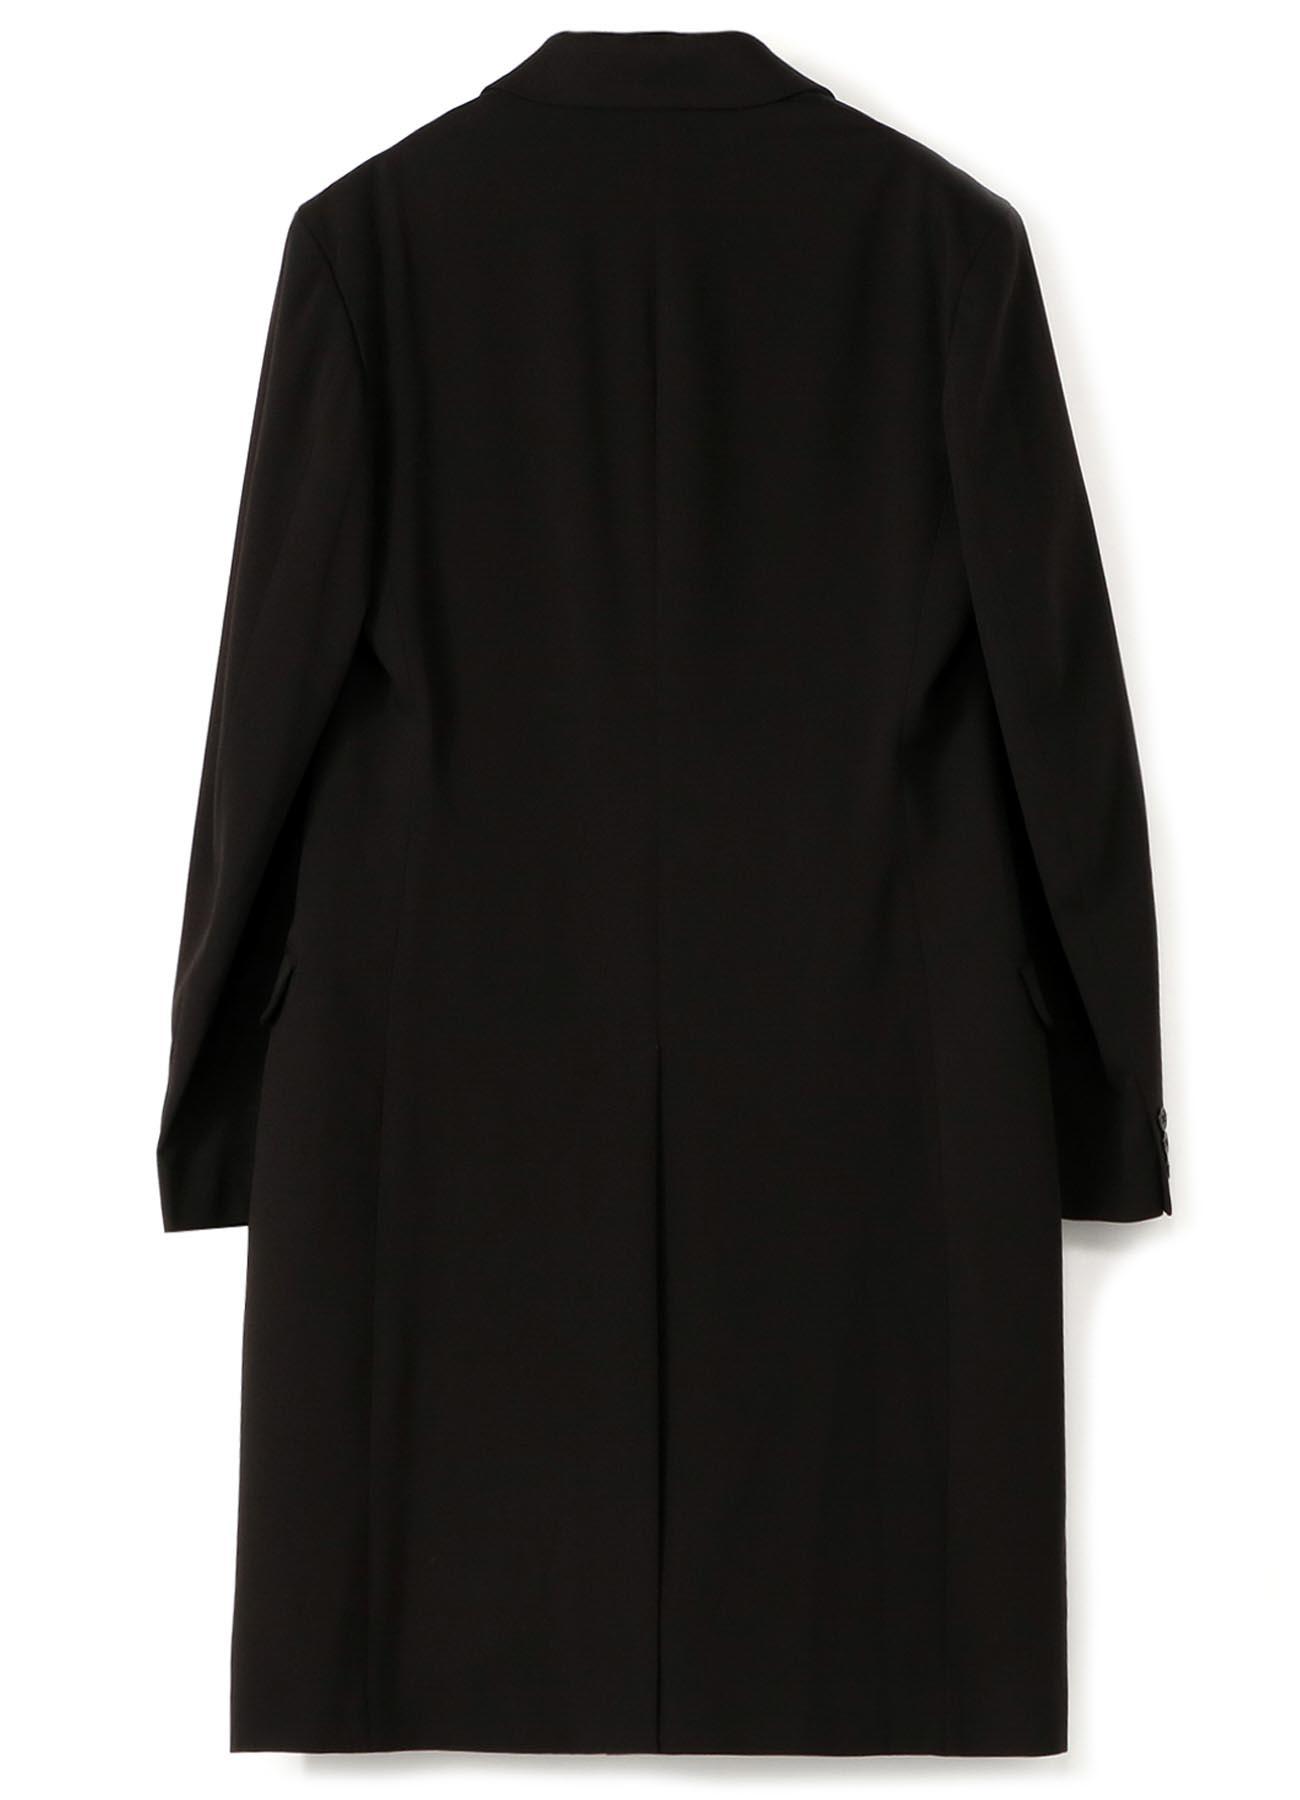 Pe/Rayon Gabardine Stretch 3BS Slim Long Jacket